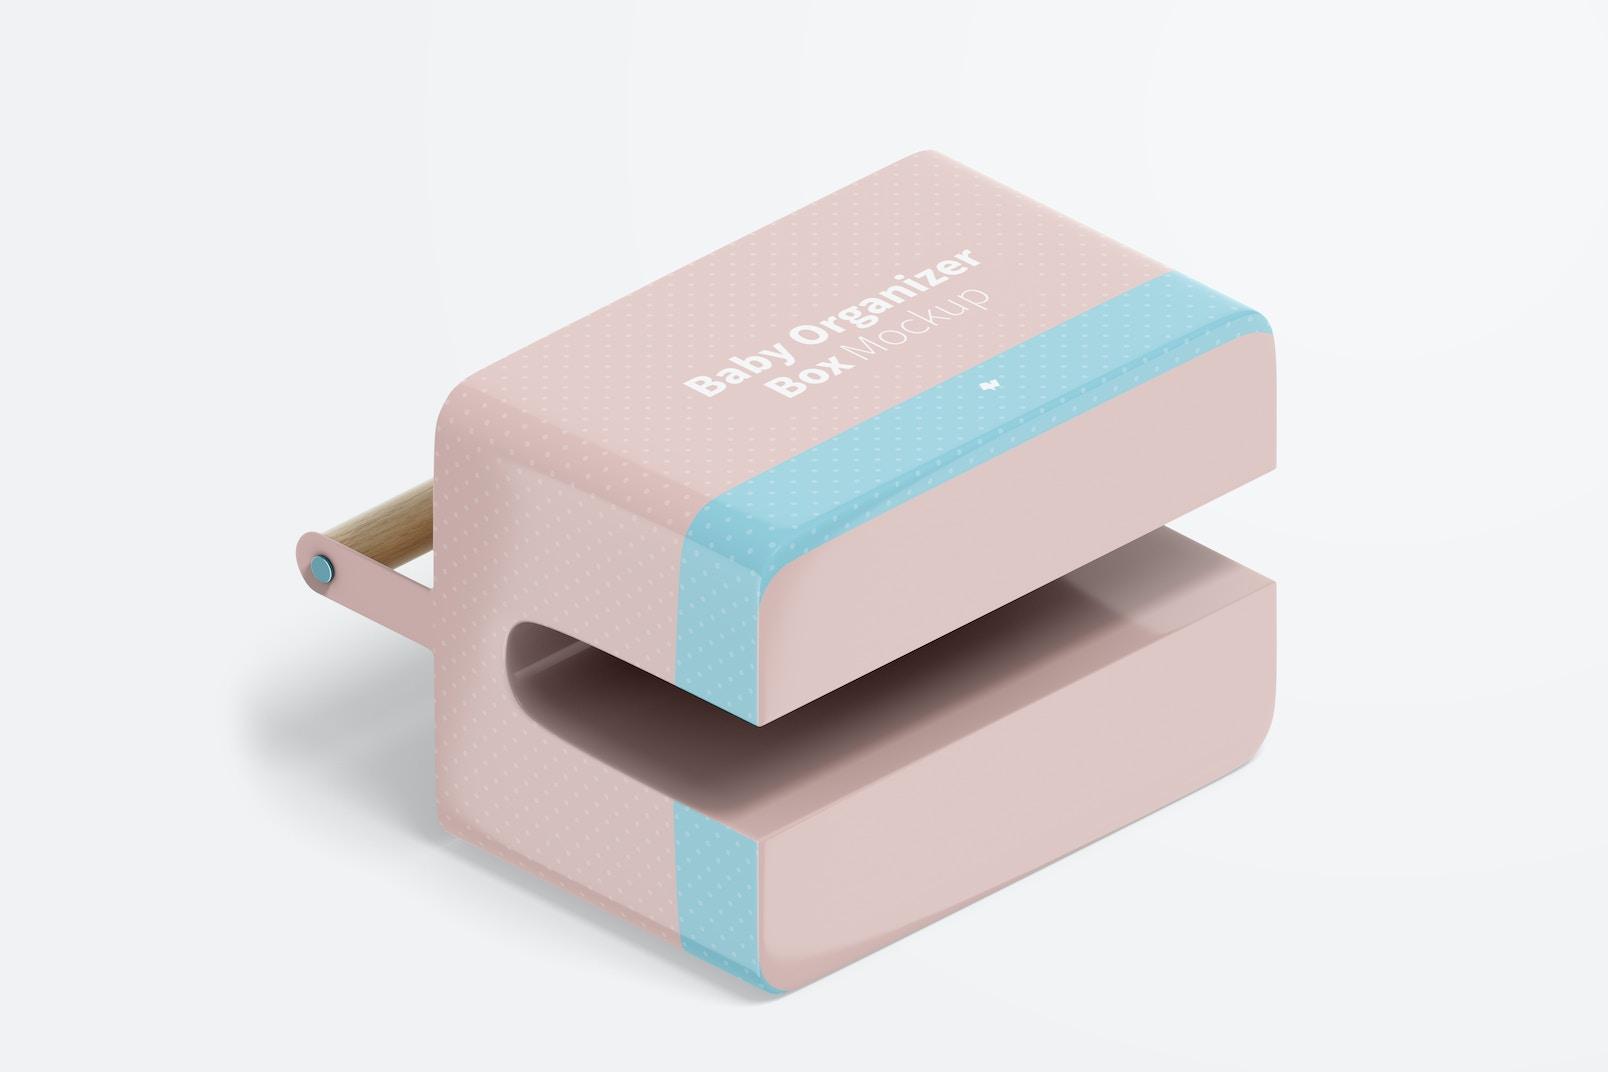 Baby Organizer Box Mockup, Isometric Right View